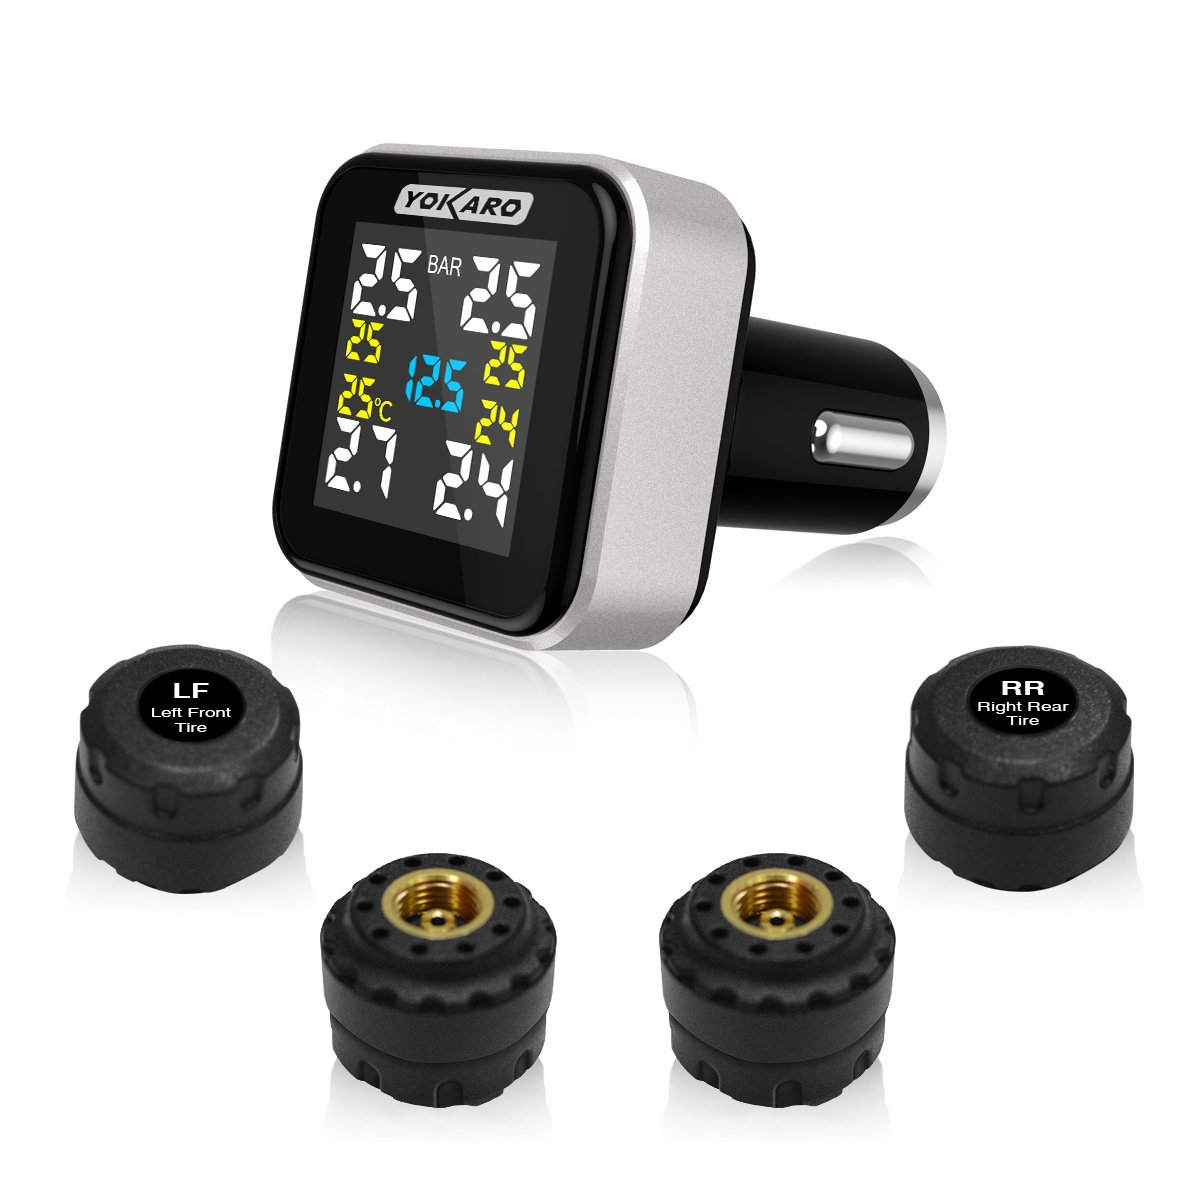 YOKARO Wireless TPMS, Tire Pressure Monitoring System for Cars, Trailer, and 4 wheeled Vehicles, 4 External Cap Sensors, Black